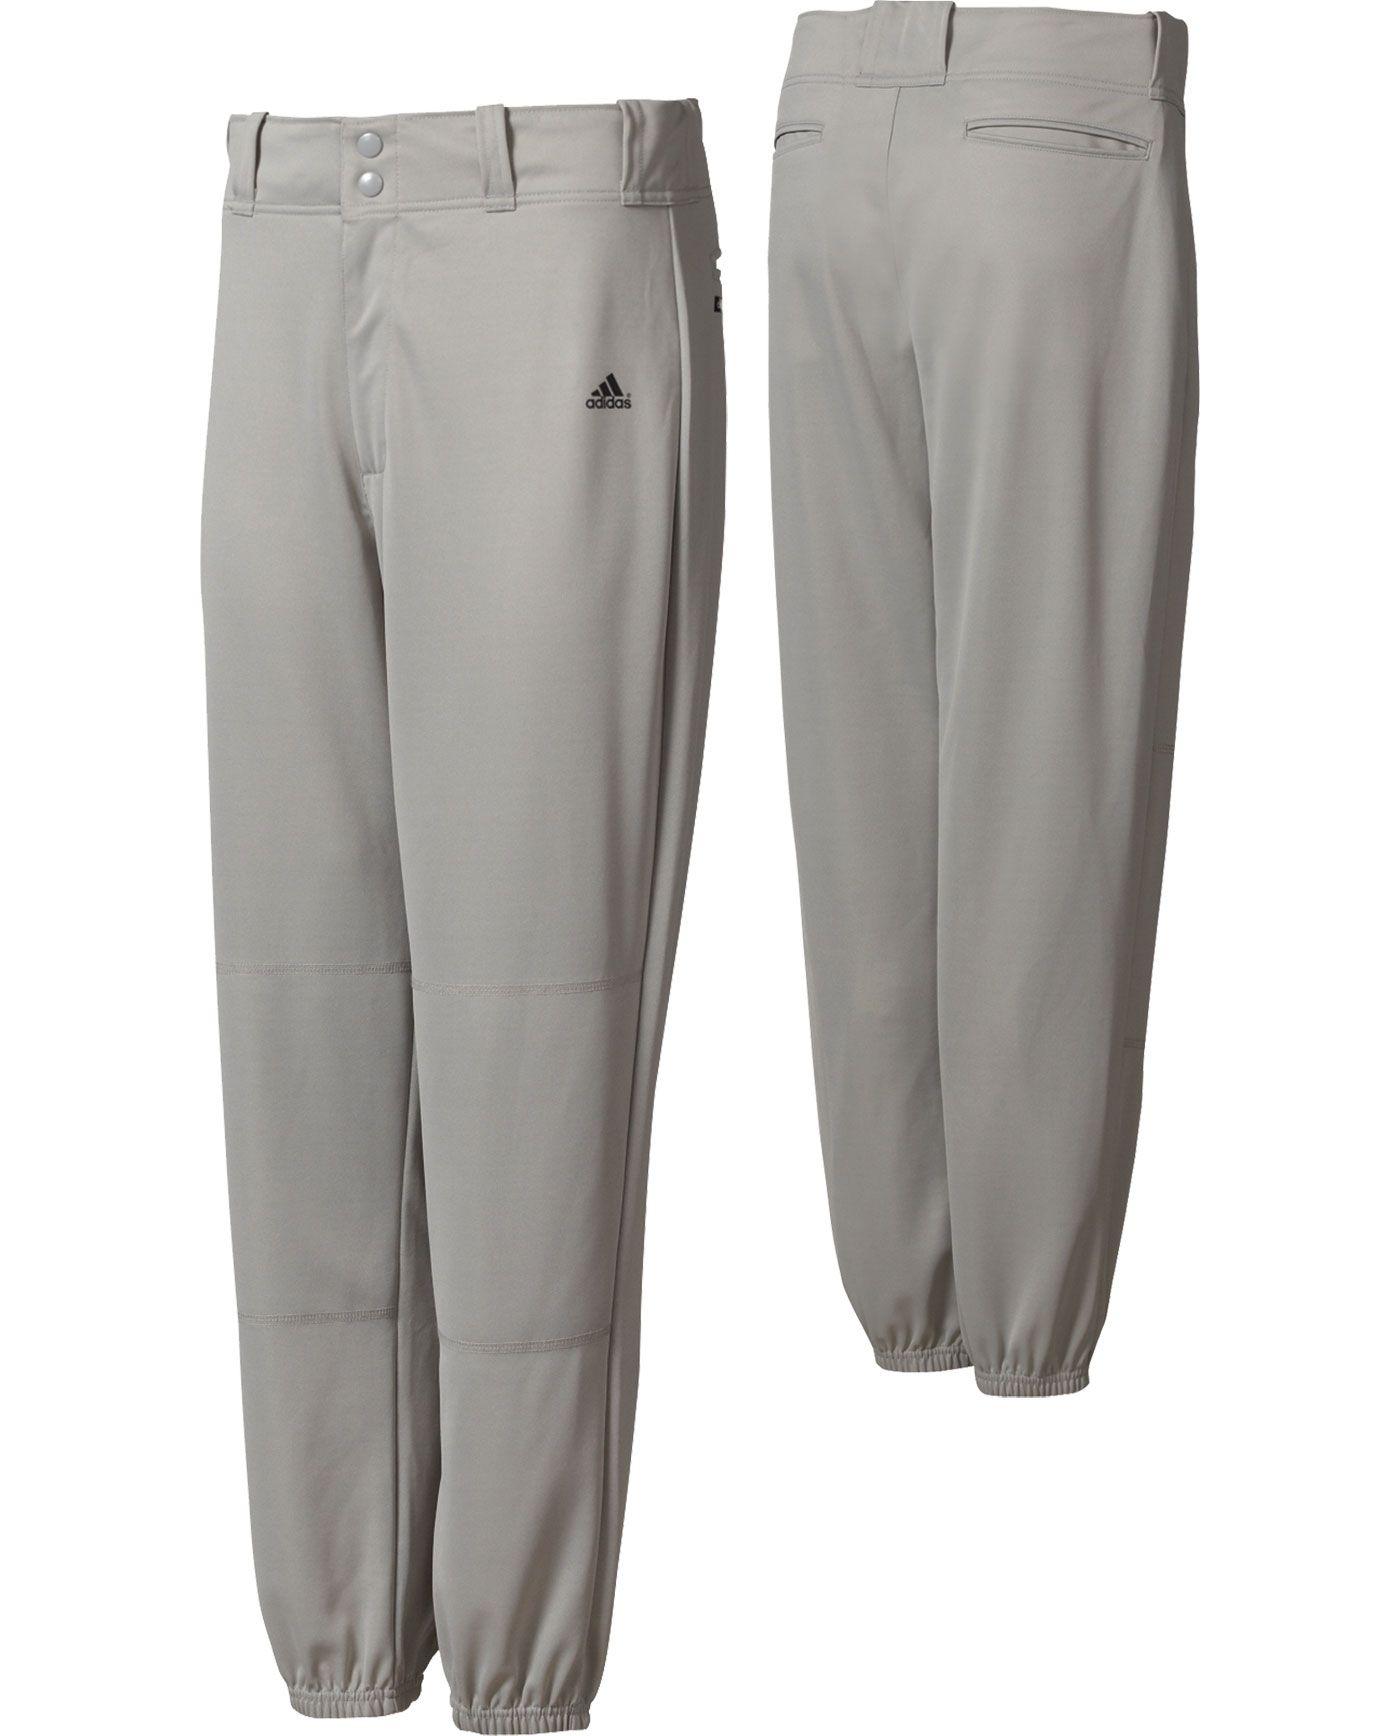 adidas Men's Incite Closed Bottom Baseball Pants